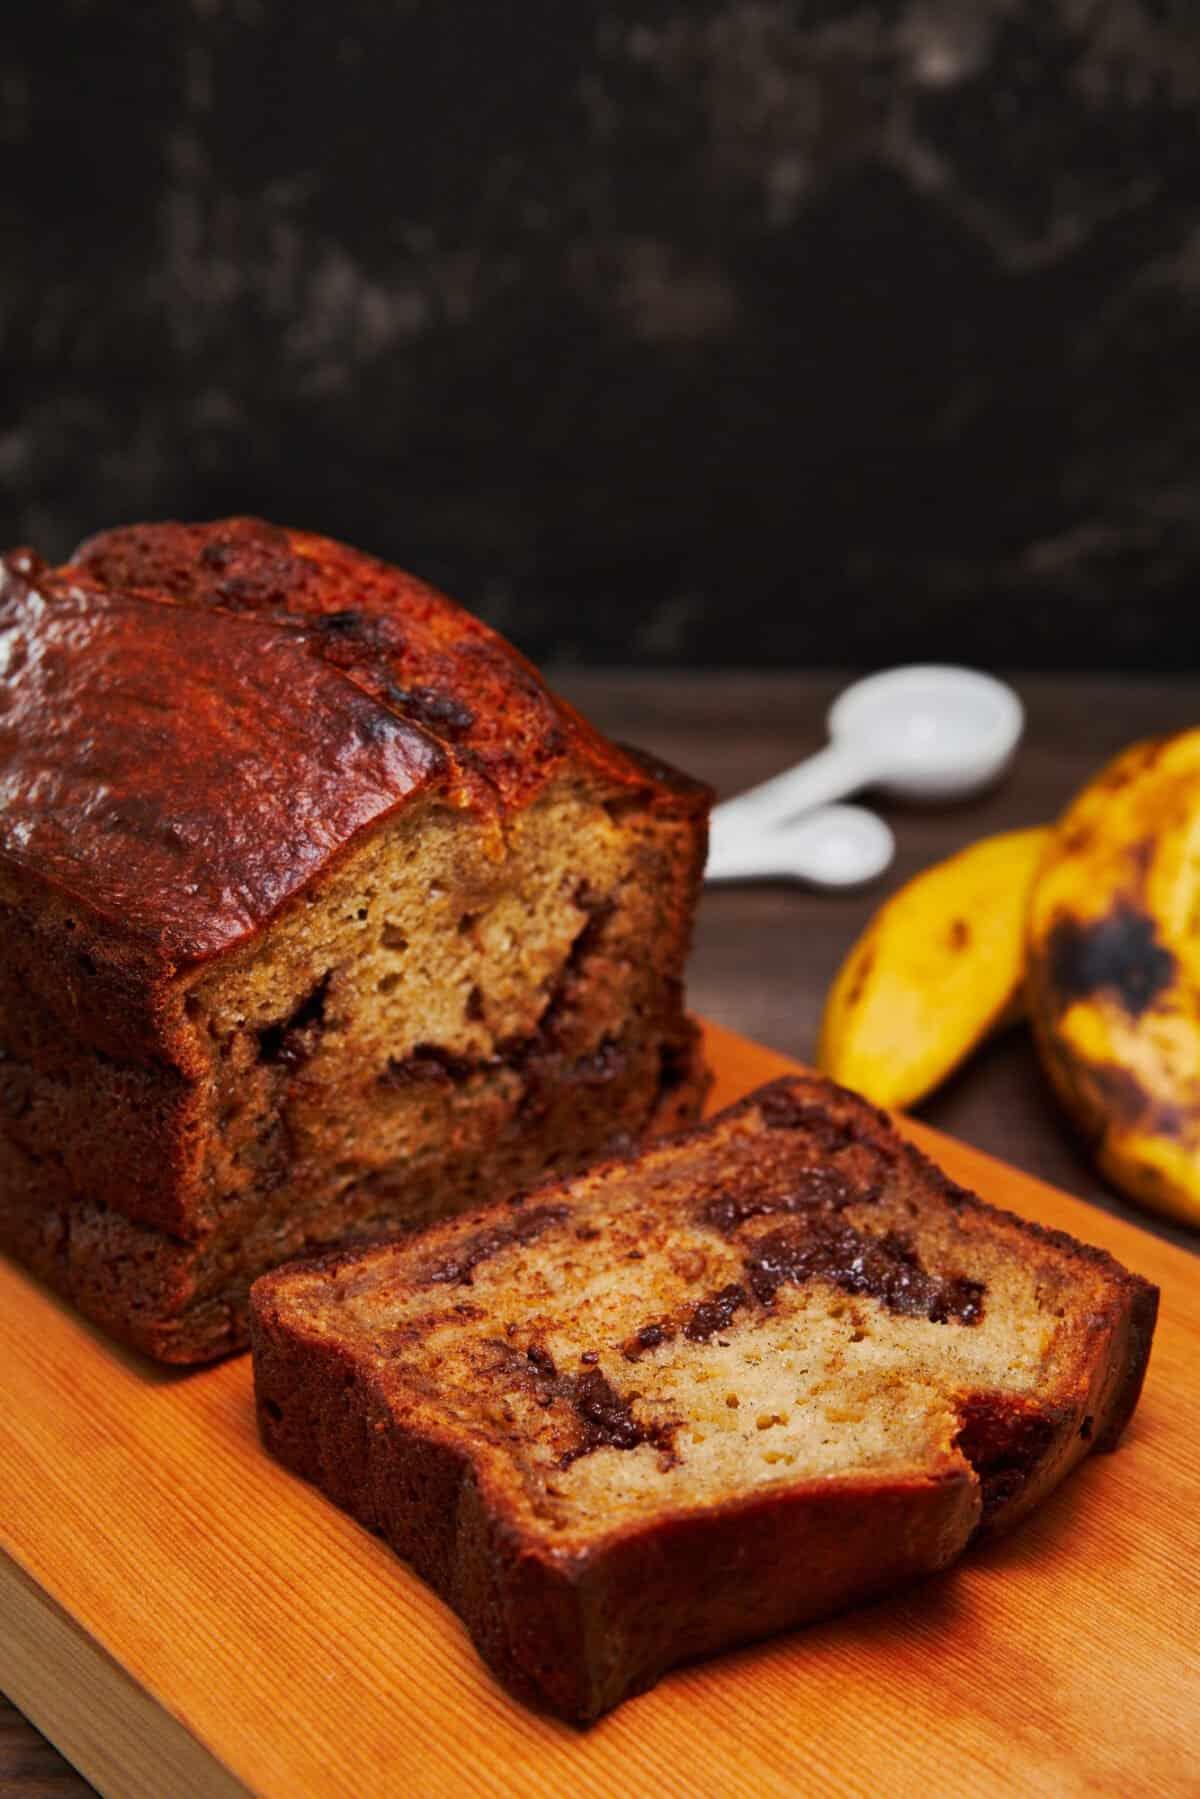 Best Banana Bread Recipe With Chocolate Chunks